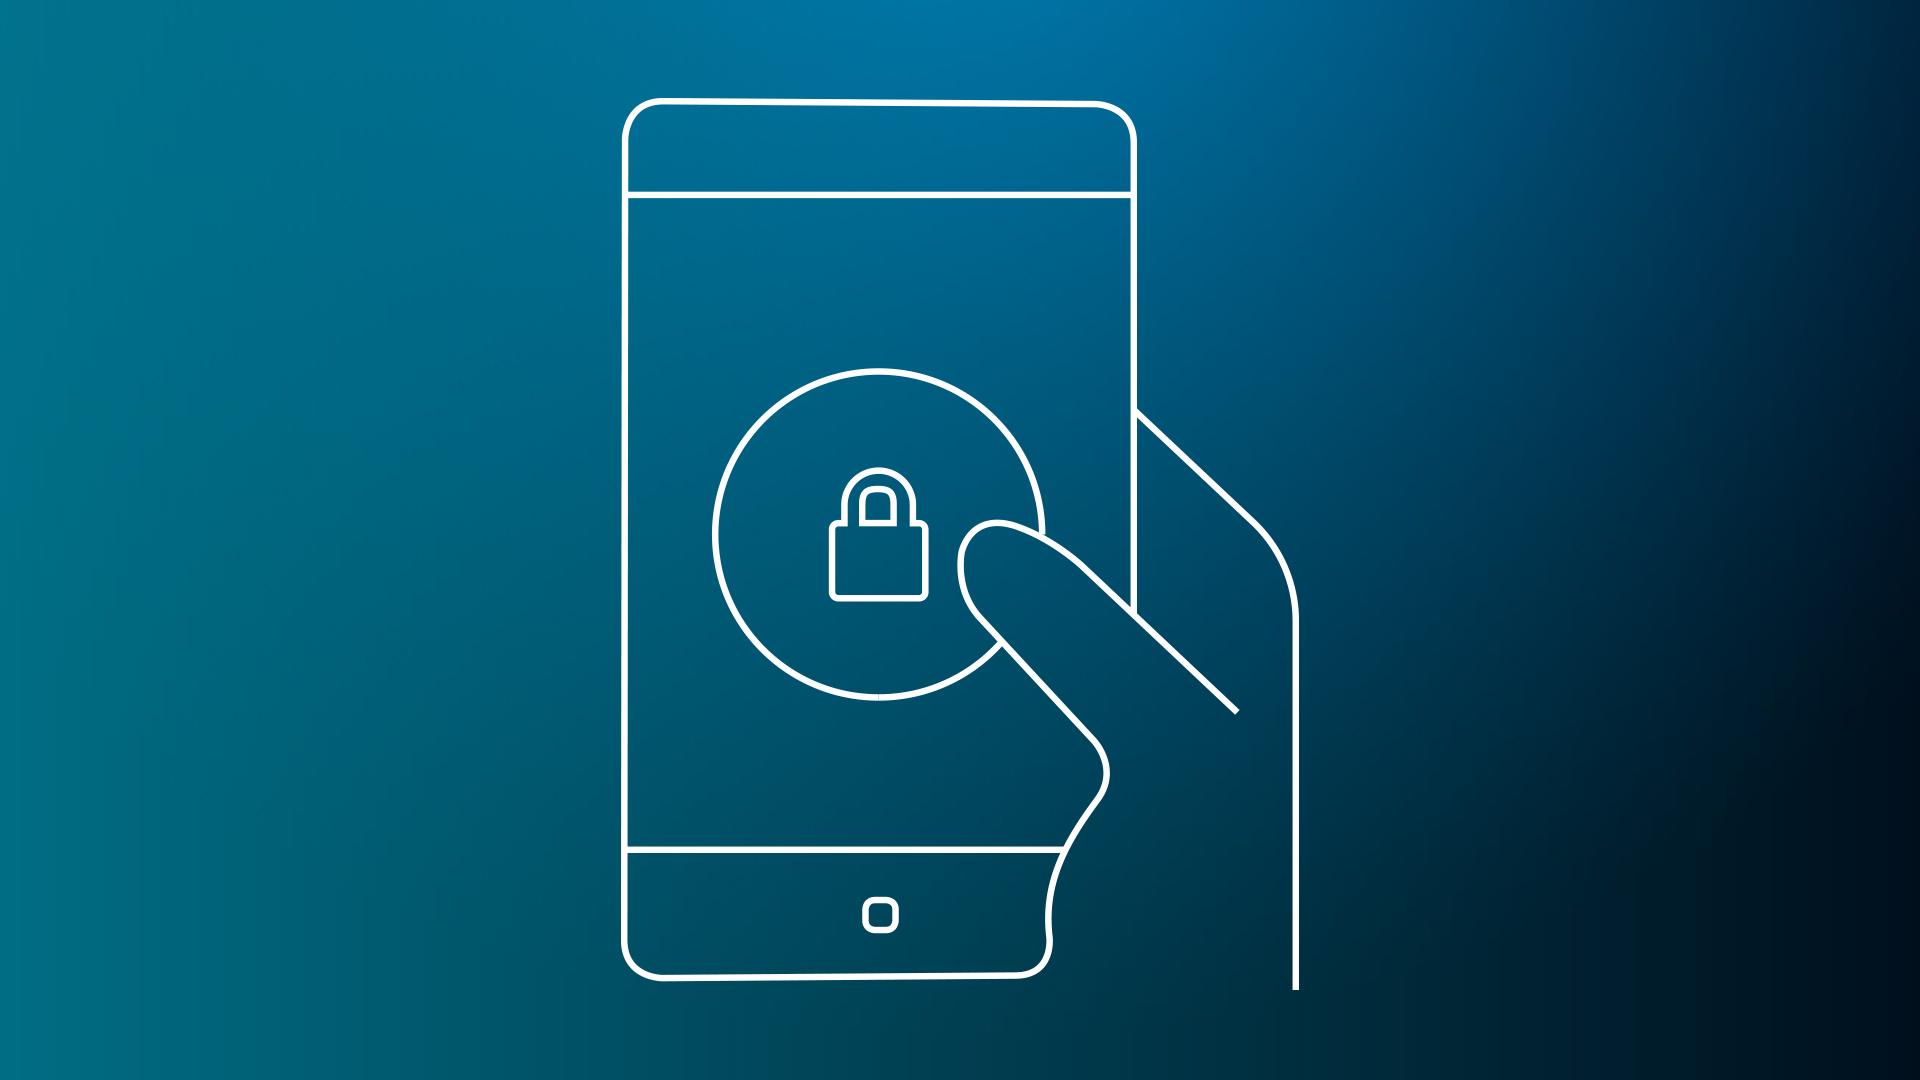 Sicherheit per App